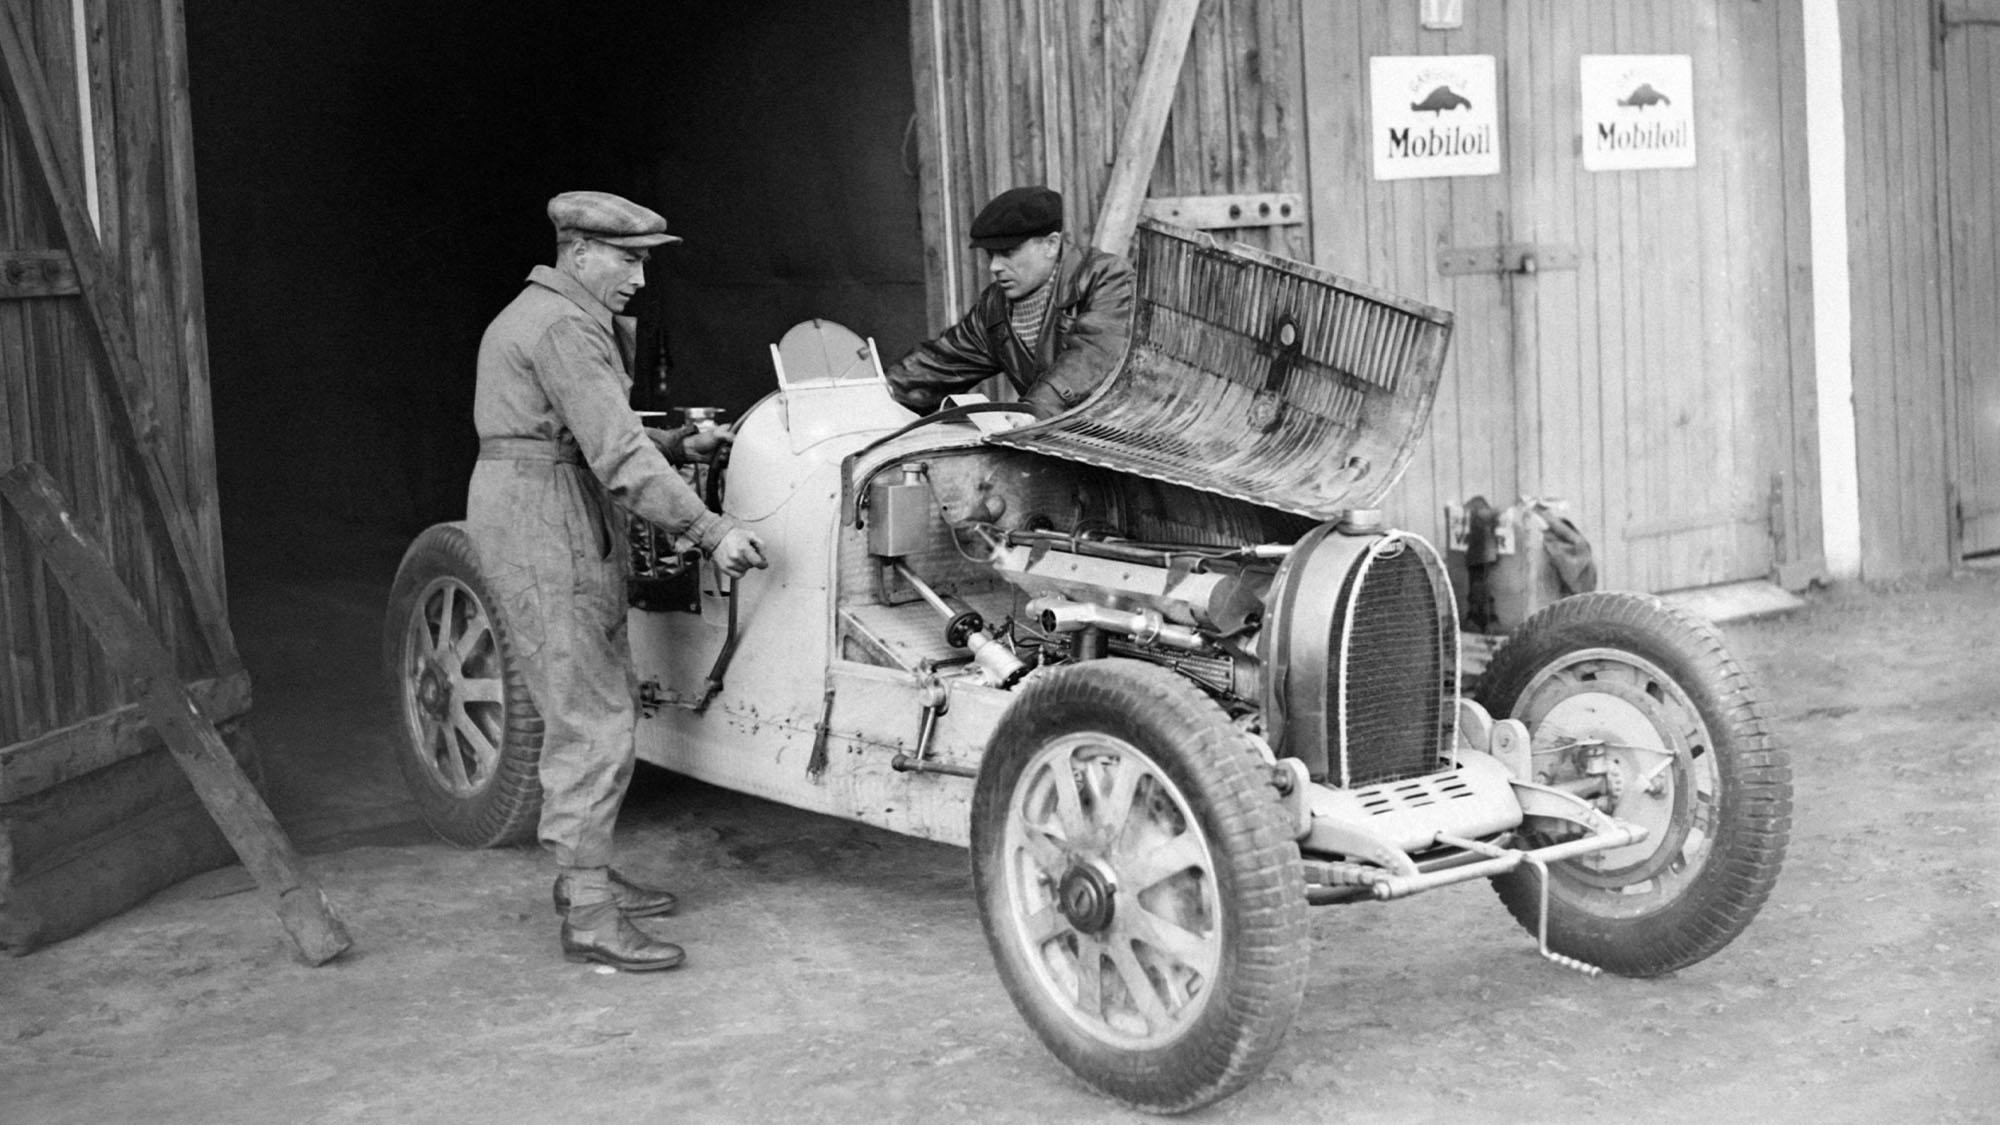 MONTLHERY, FRANCE - NON DATE: Le pilote automobile Robert Benoist travaillant sur sa Bugatti avec son mecanicien, a Montlhery, France. (Photo by Keystone-France\Gamma-Rapho via Getty Images)